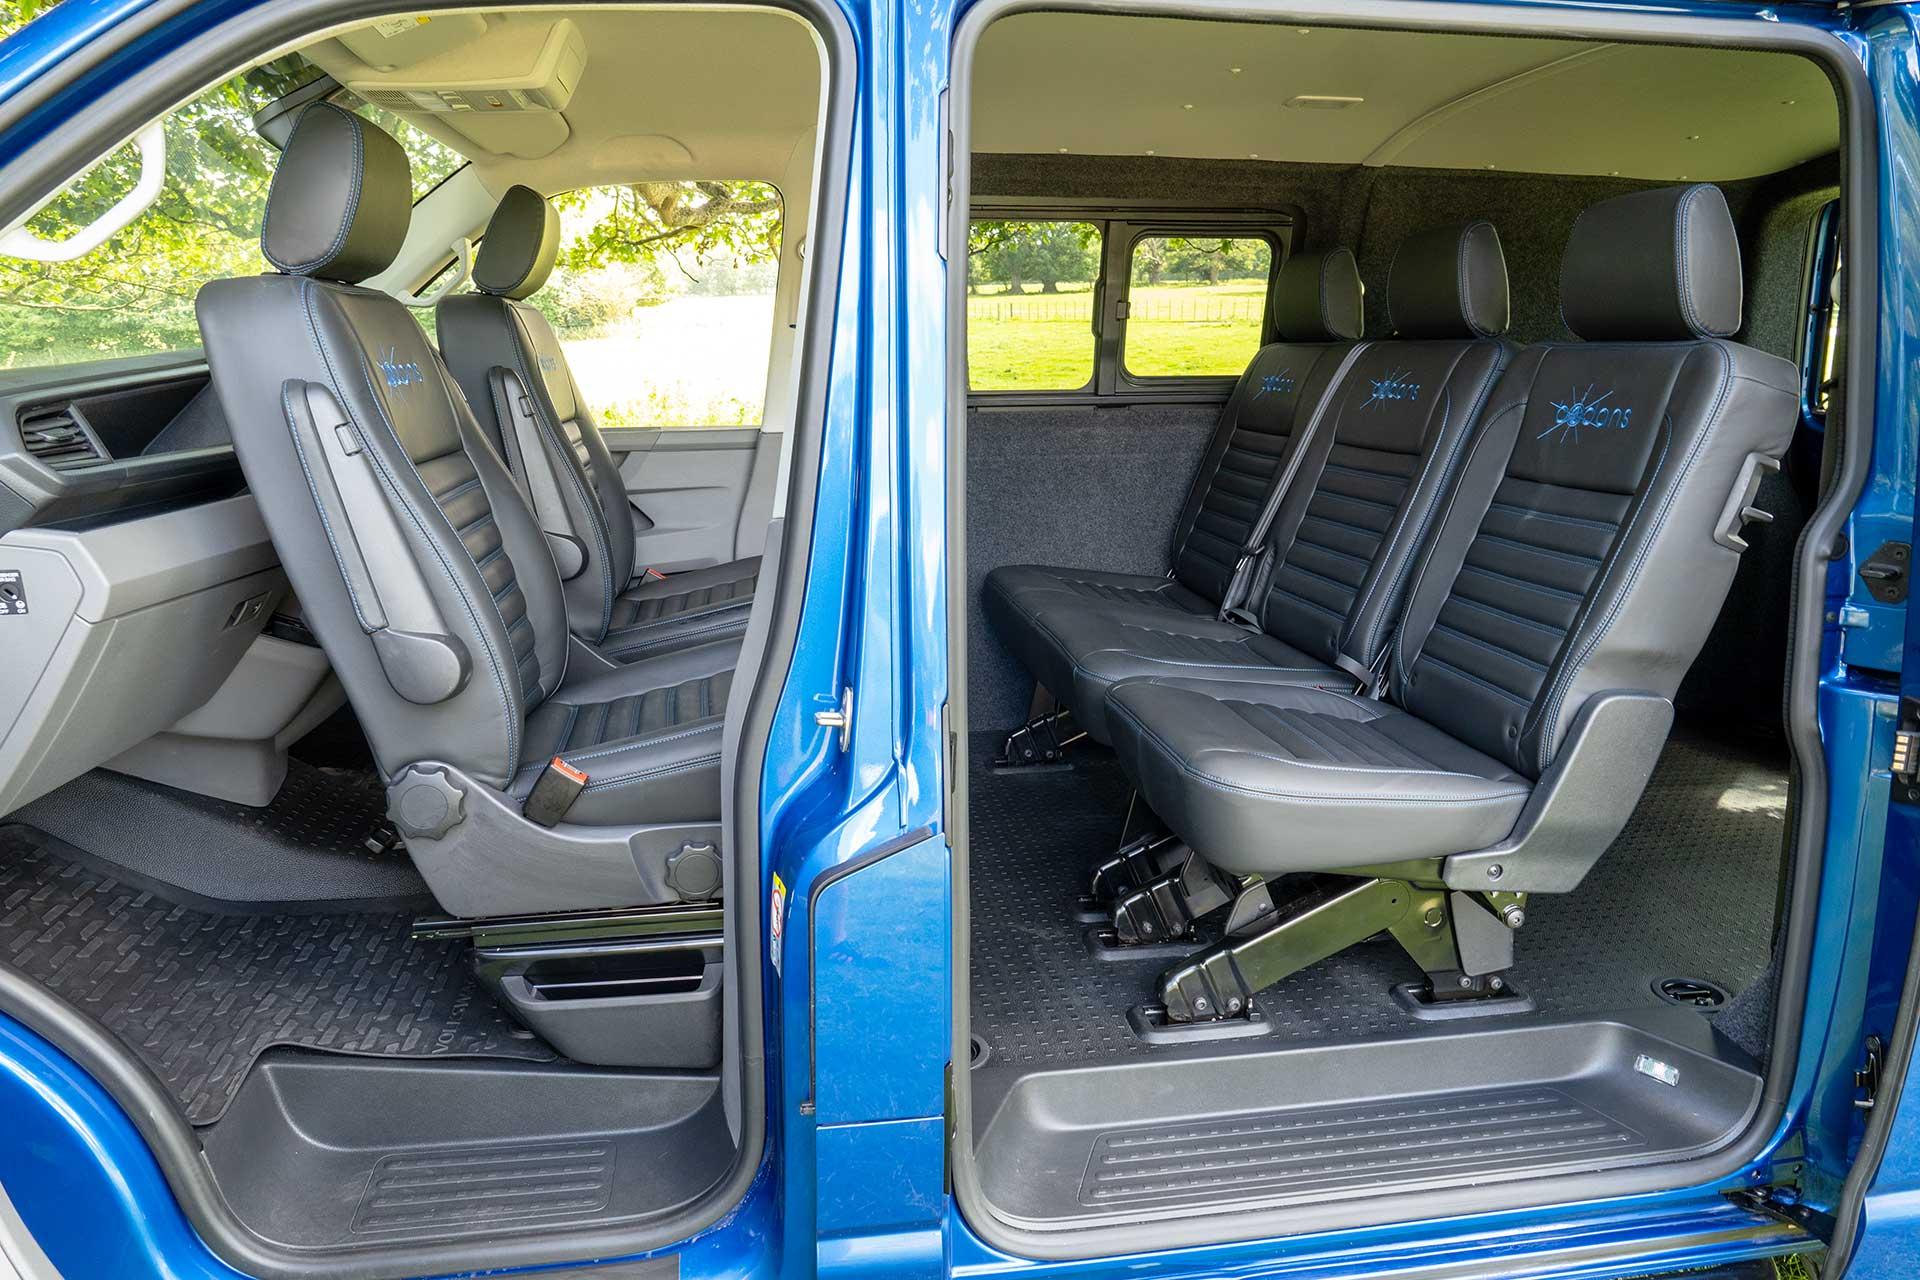 VW Kombi Van Conversions